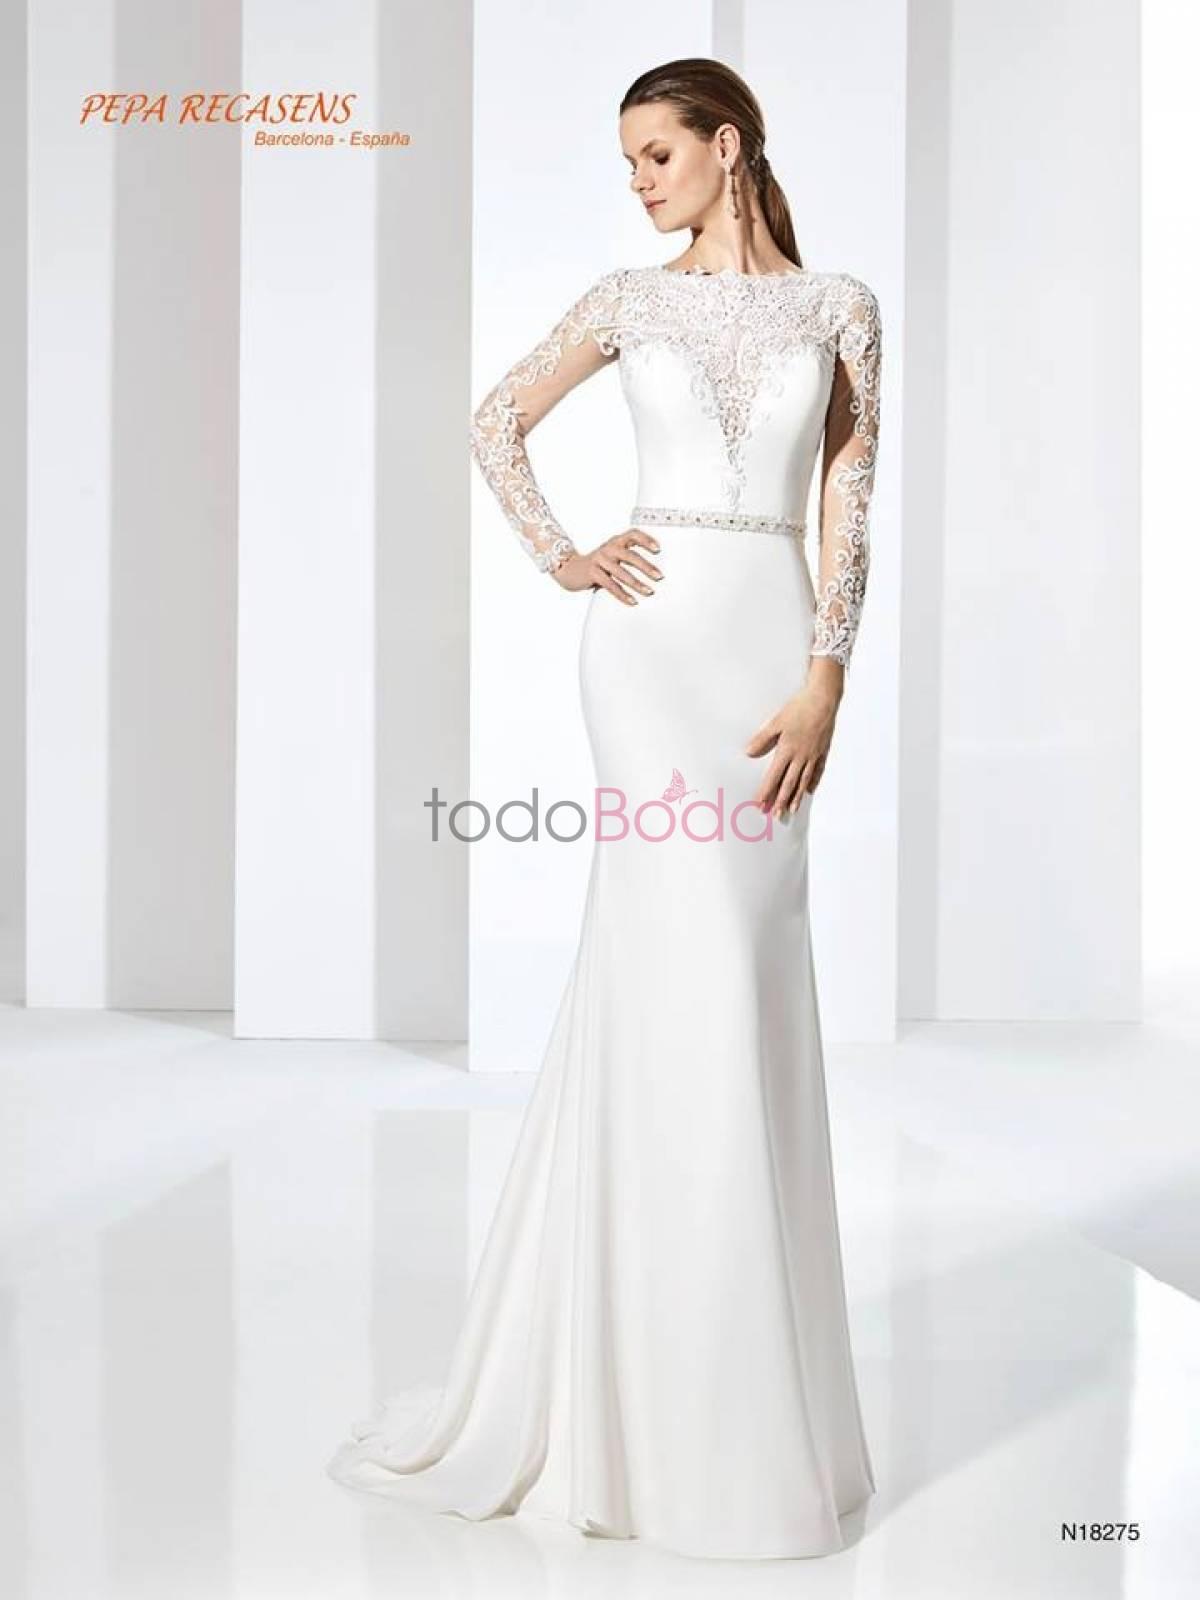 237944e37 Pepa Recansens. Vestidos de Novia Barcelona Madrid Valencia Andalucia.  Coleccion 13